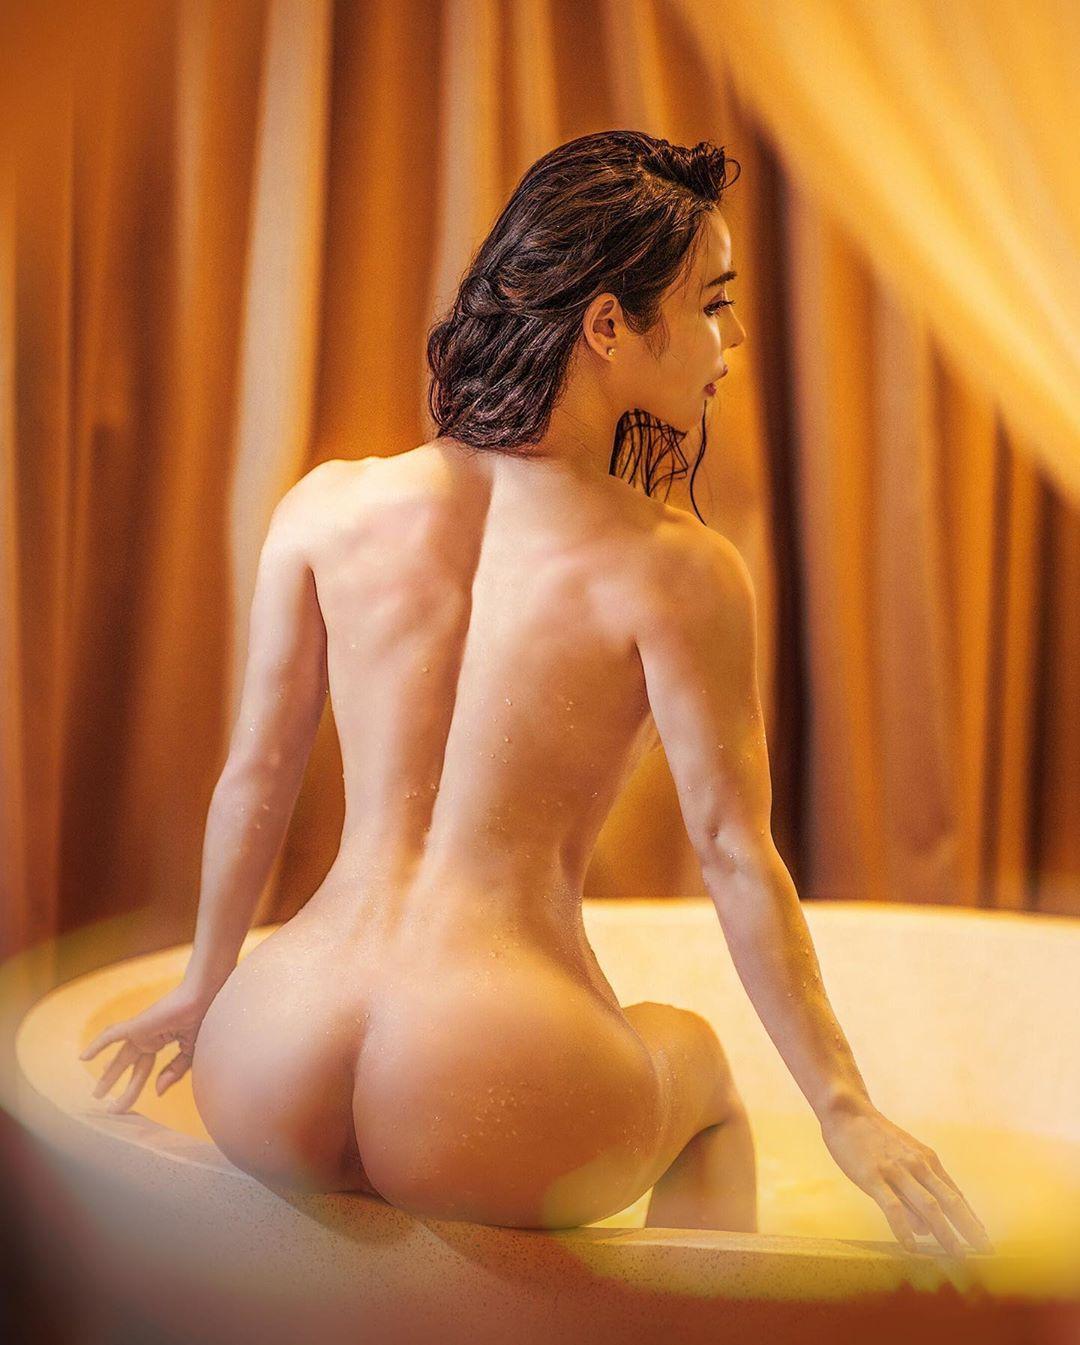 Nude Bath Photo photo 28